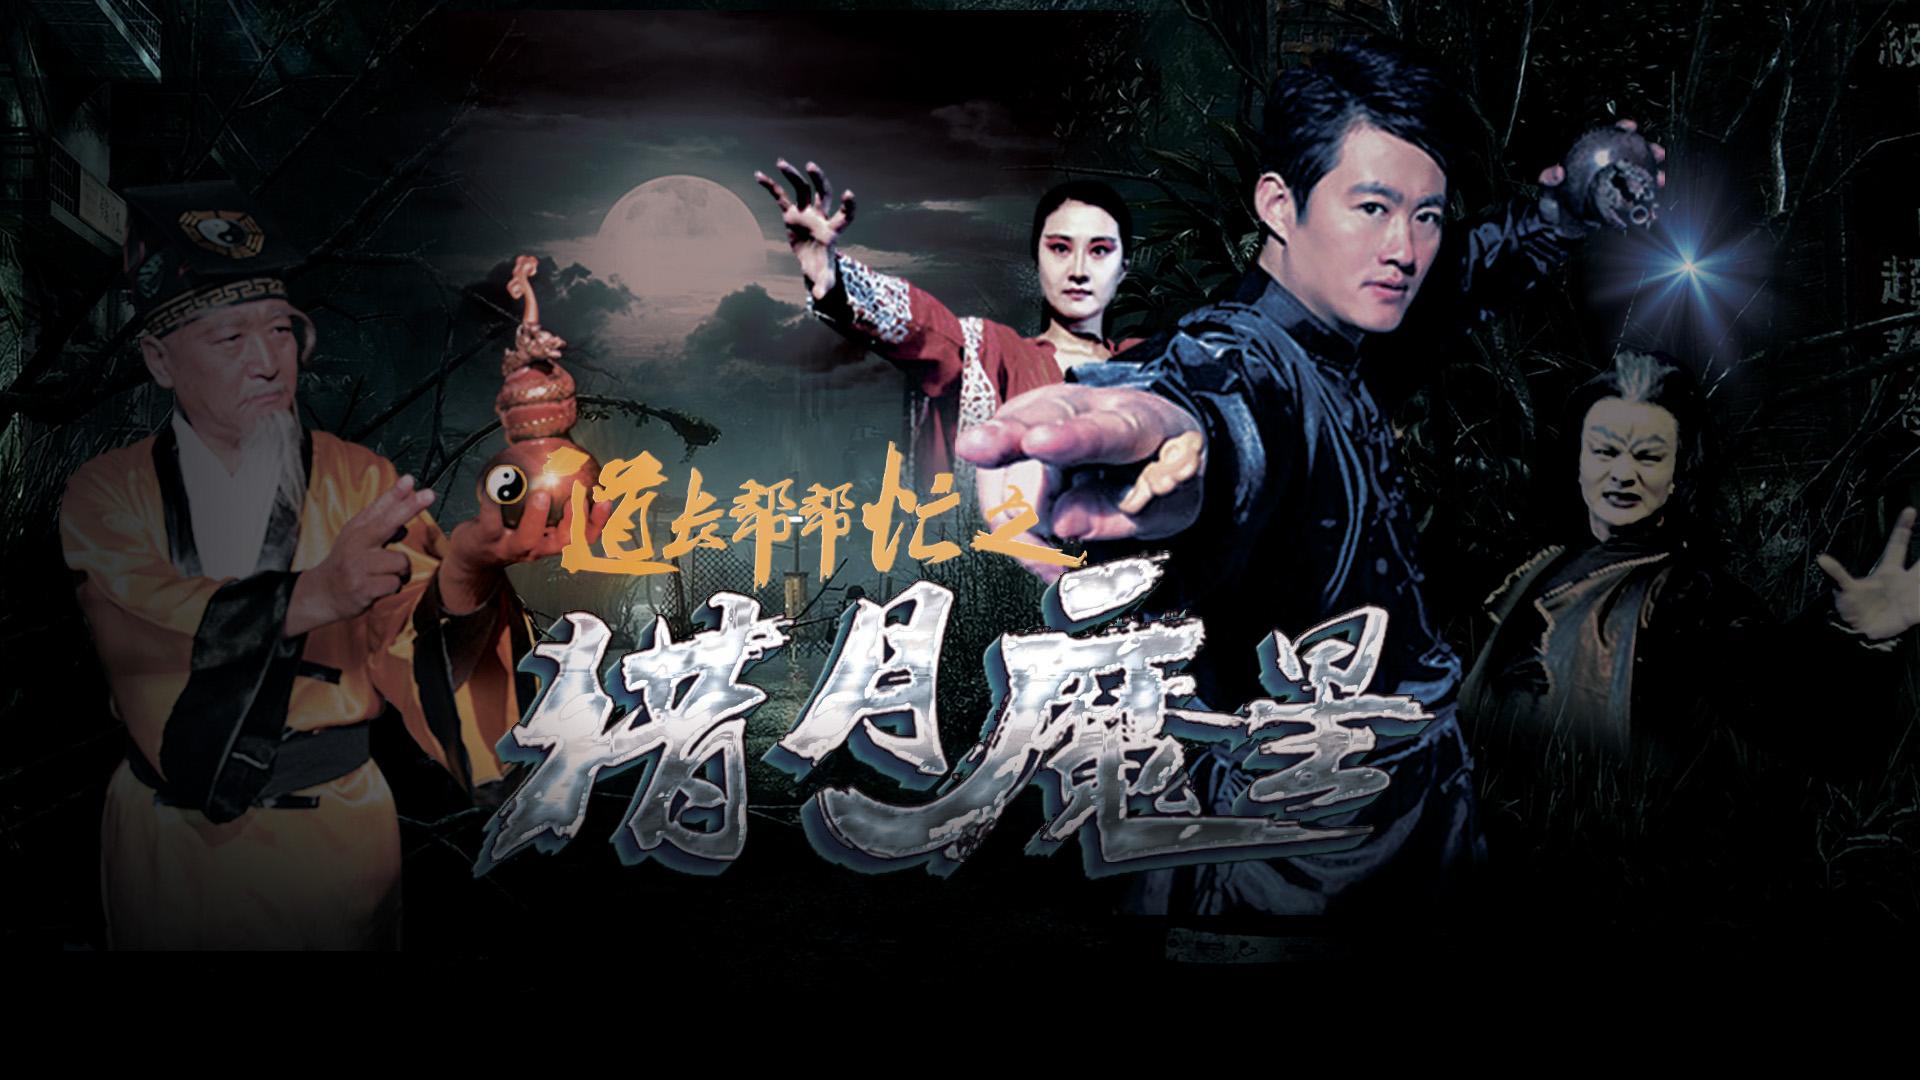 cos-道长帮帮忙之猎月魔星 电影 高清在线观看 搜狐视频会员